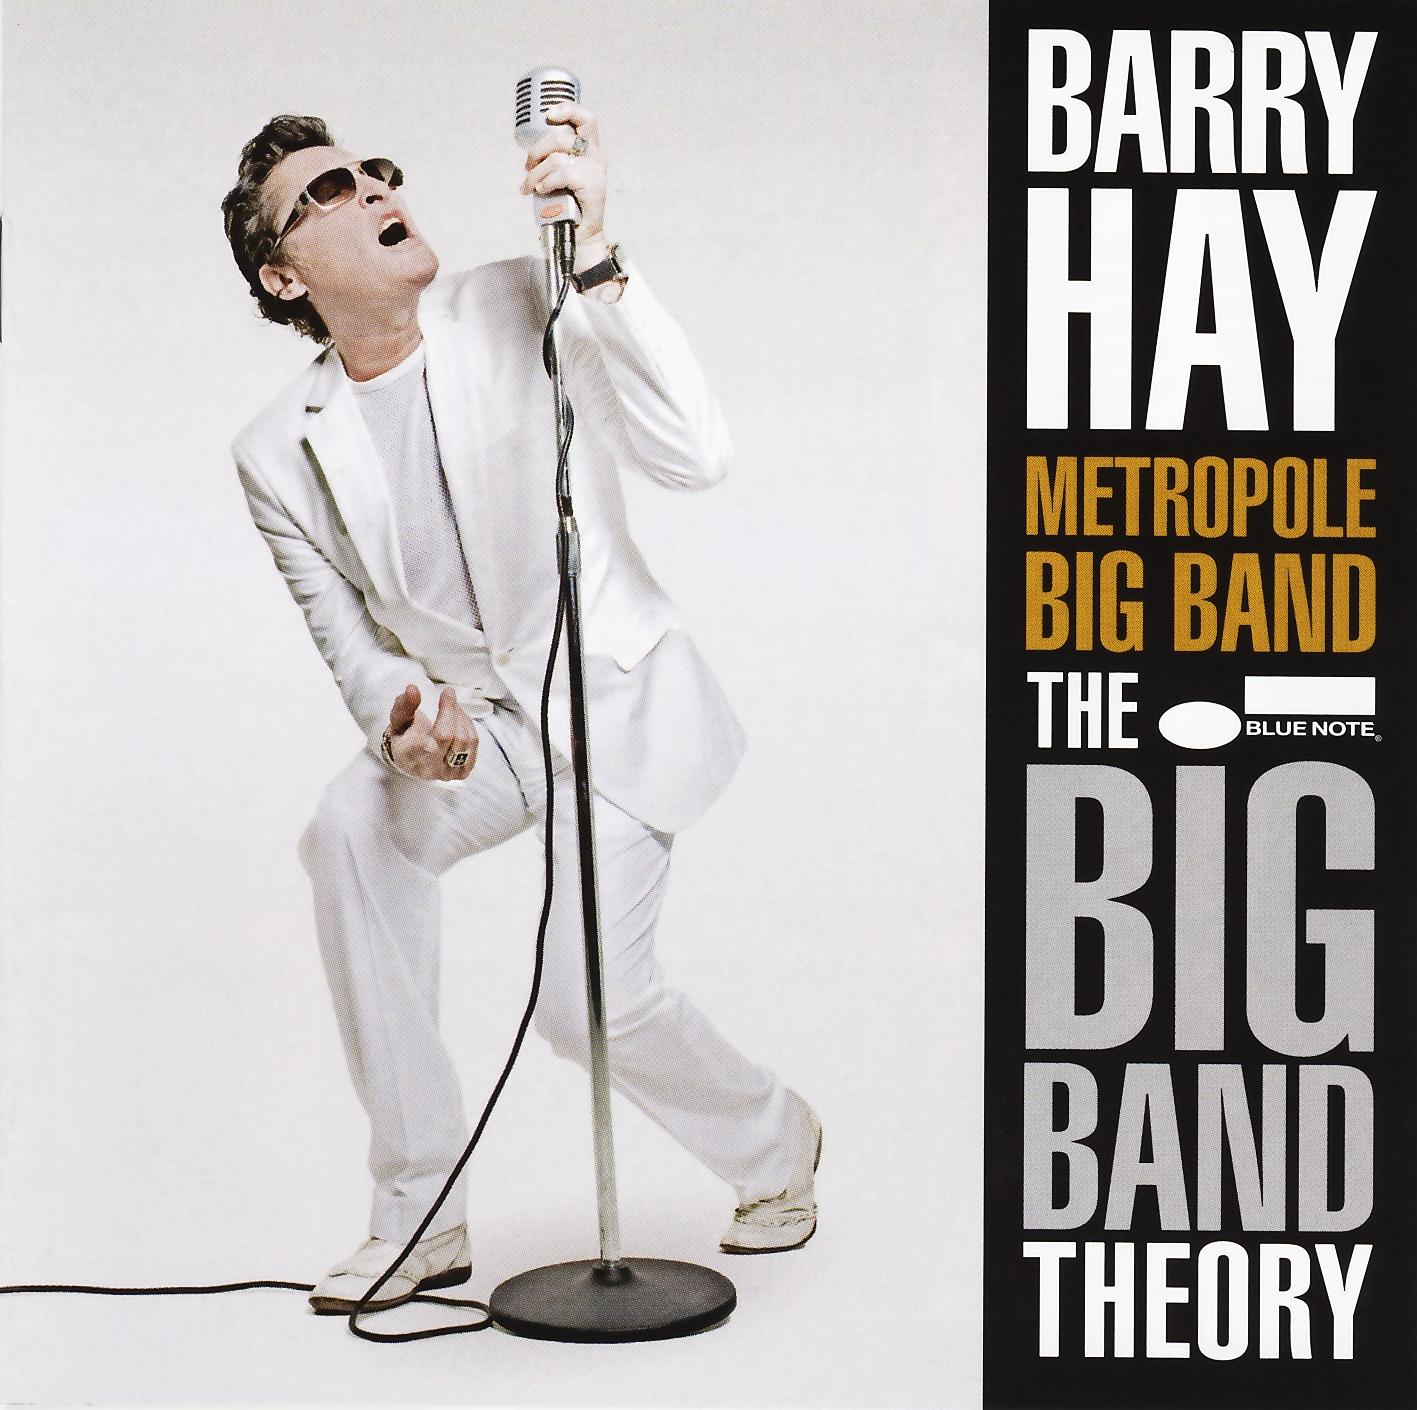 Barry Hay & Metropole Big Band - The Big Band Theory